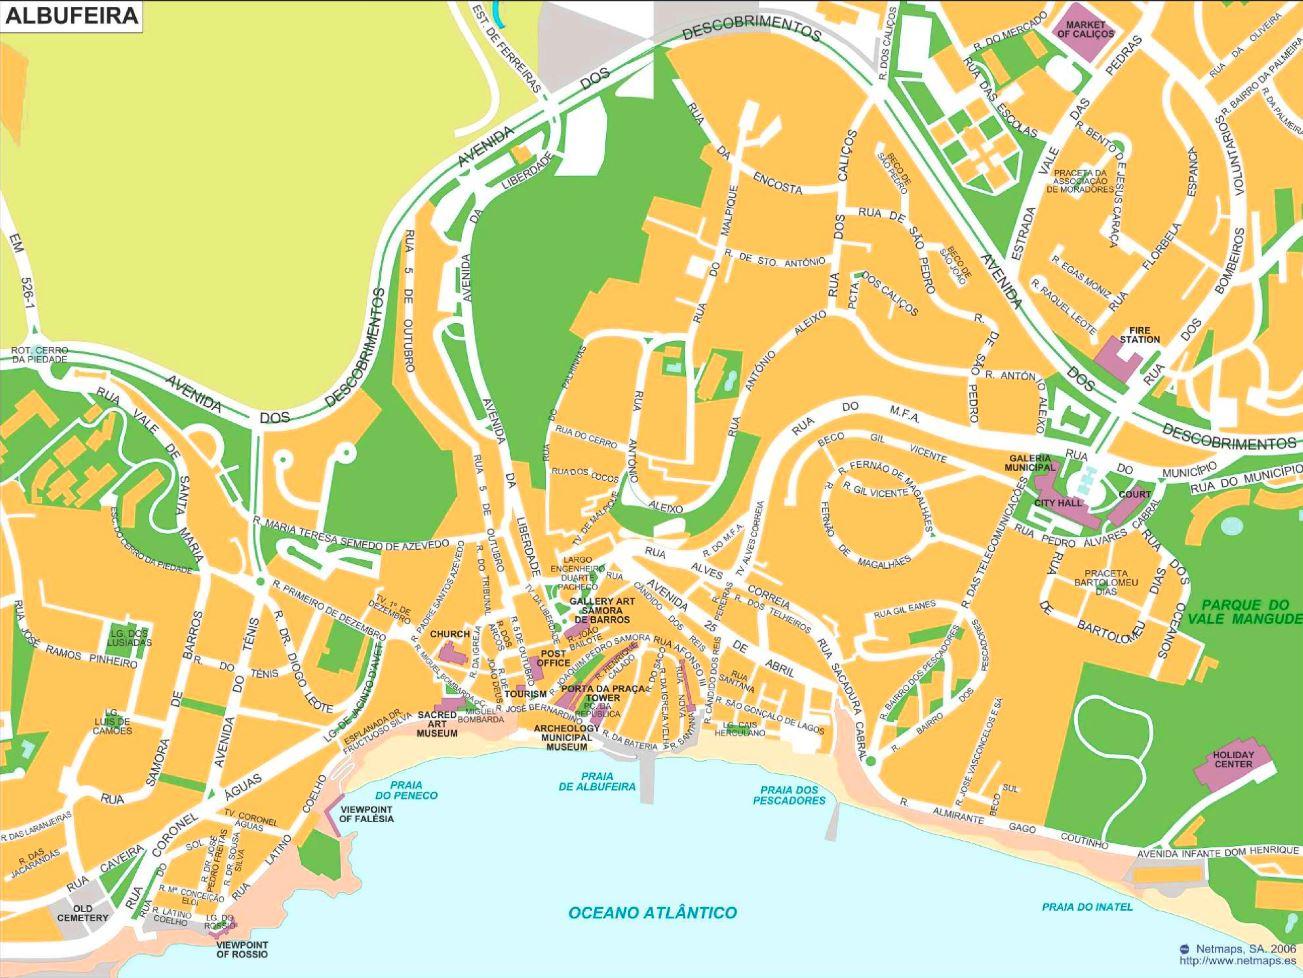 Albufeira Tourist Map